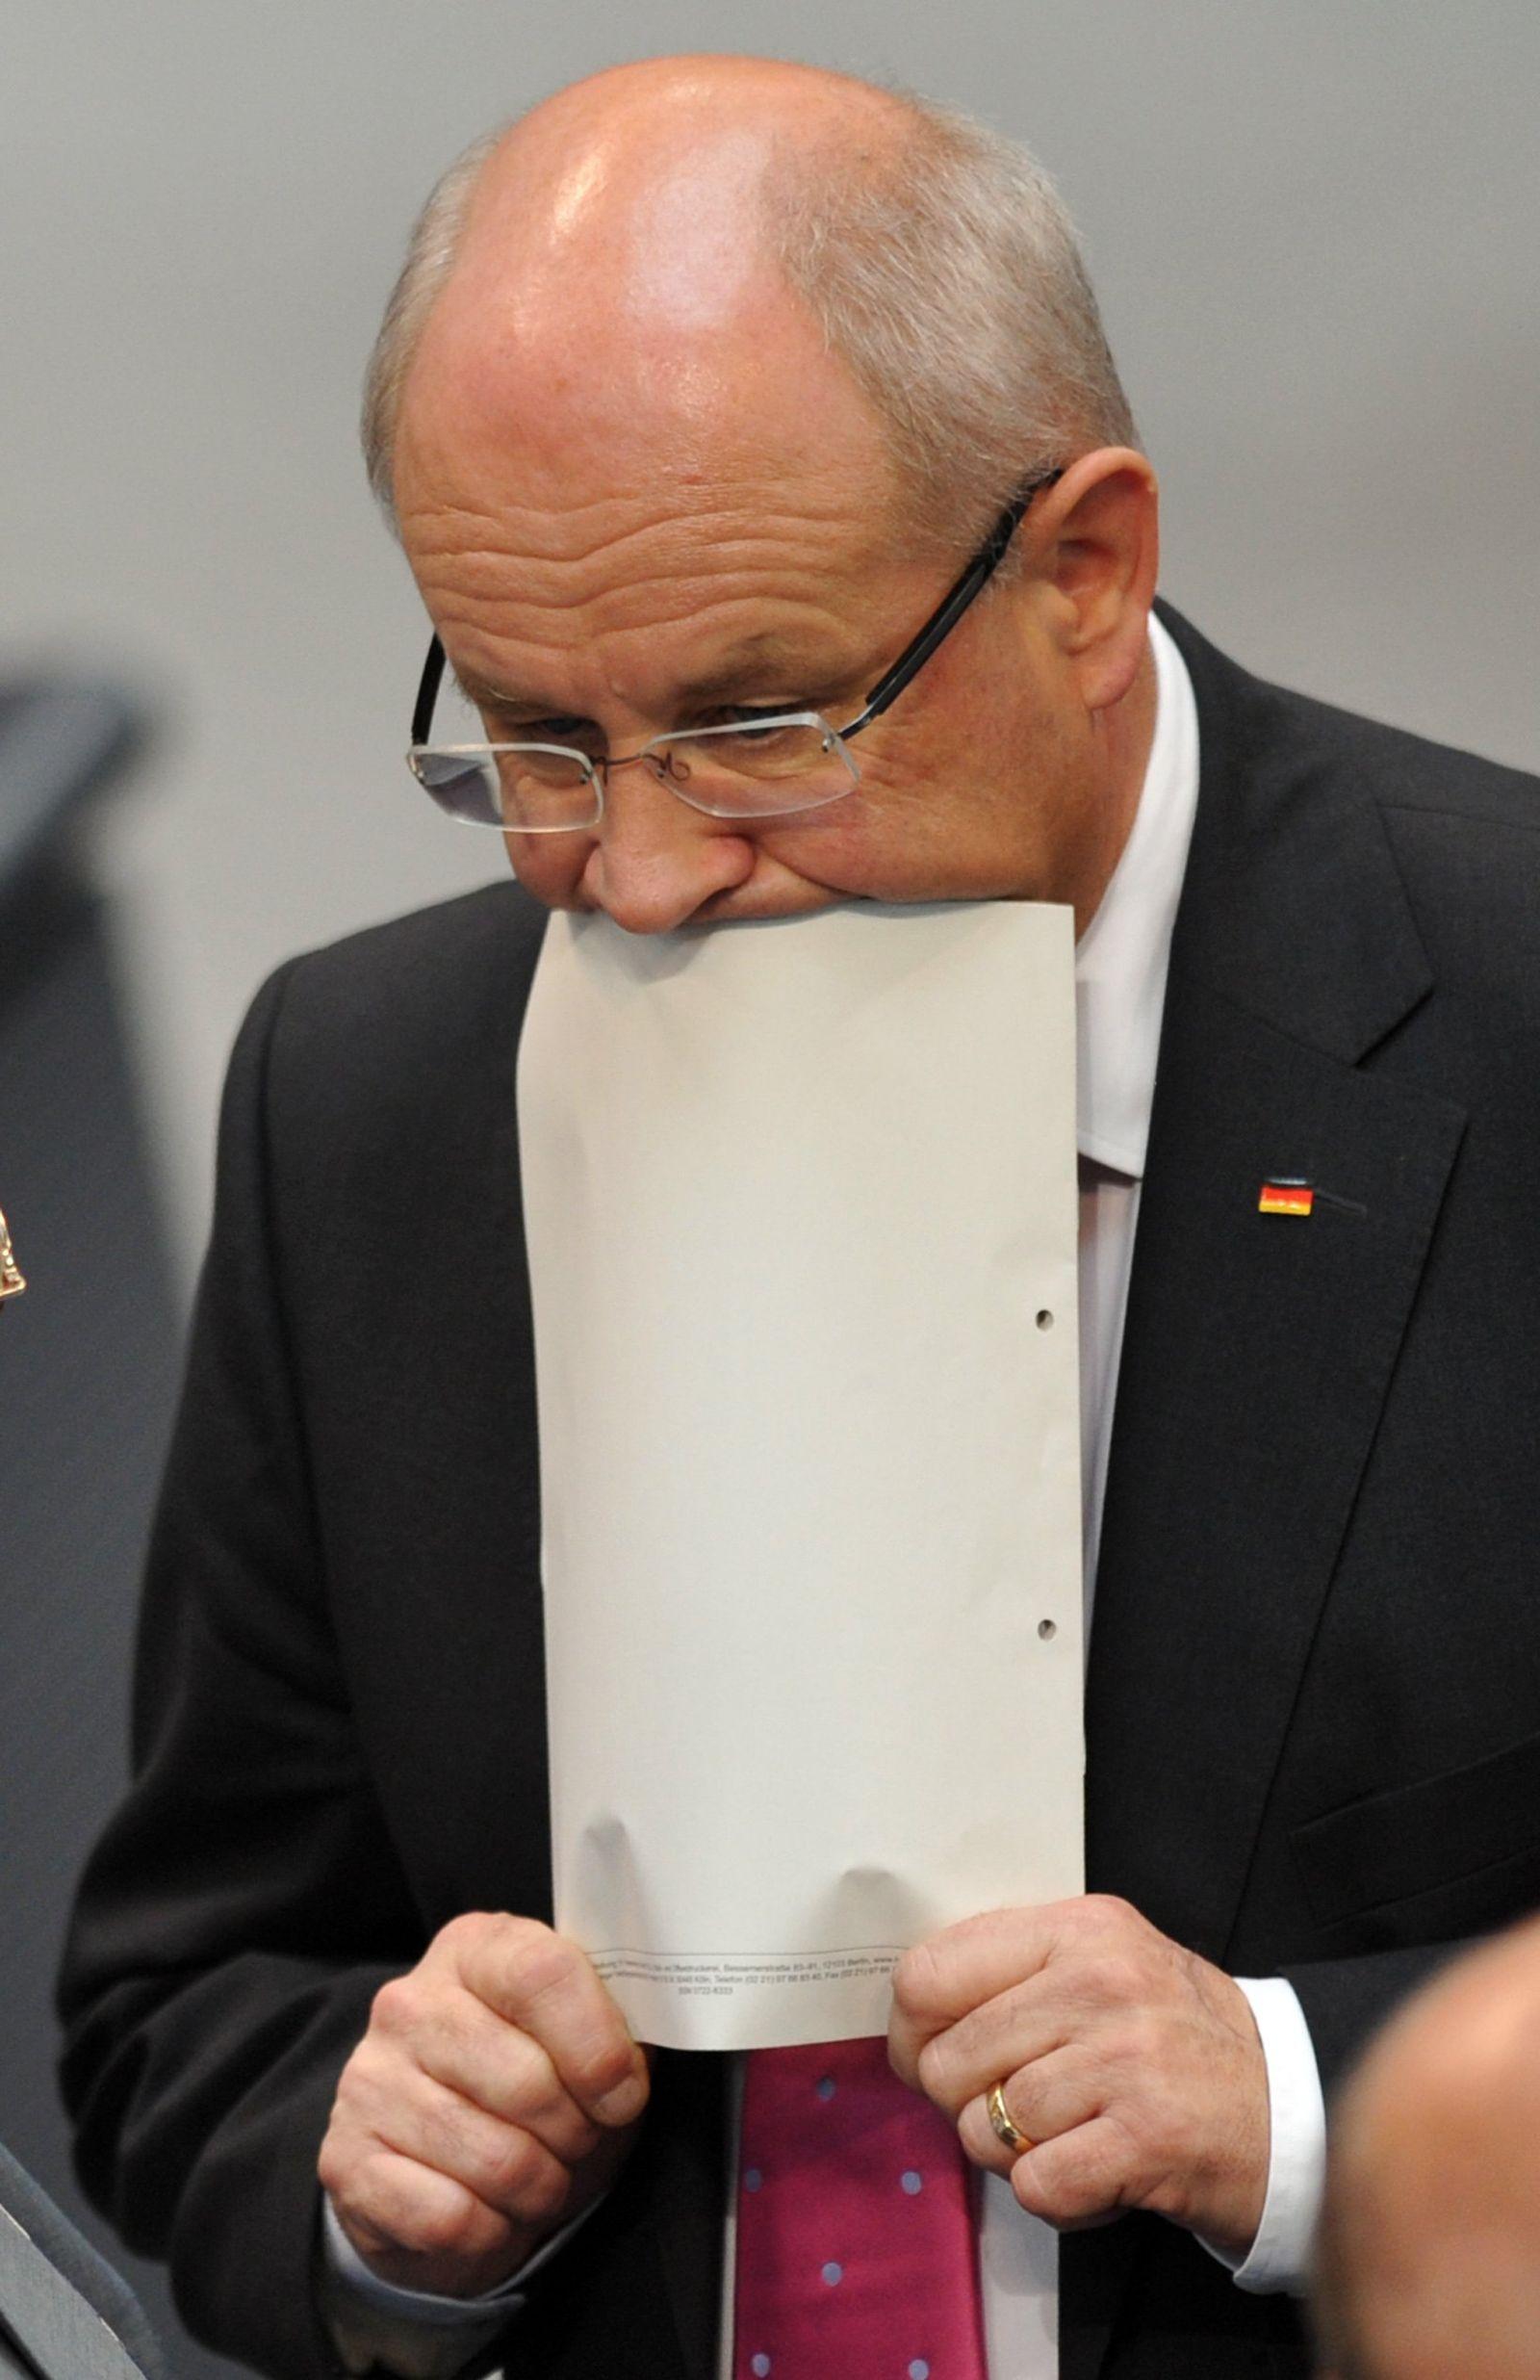 Bundestag volker kauder